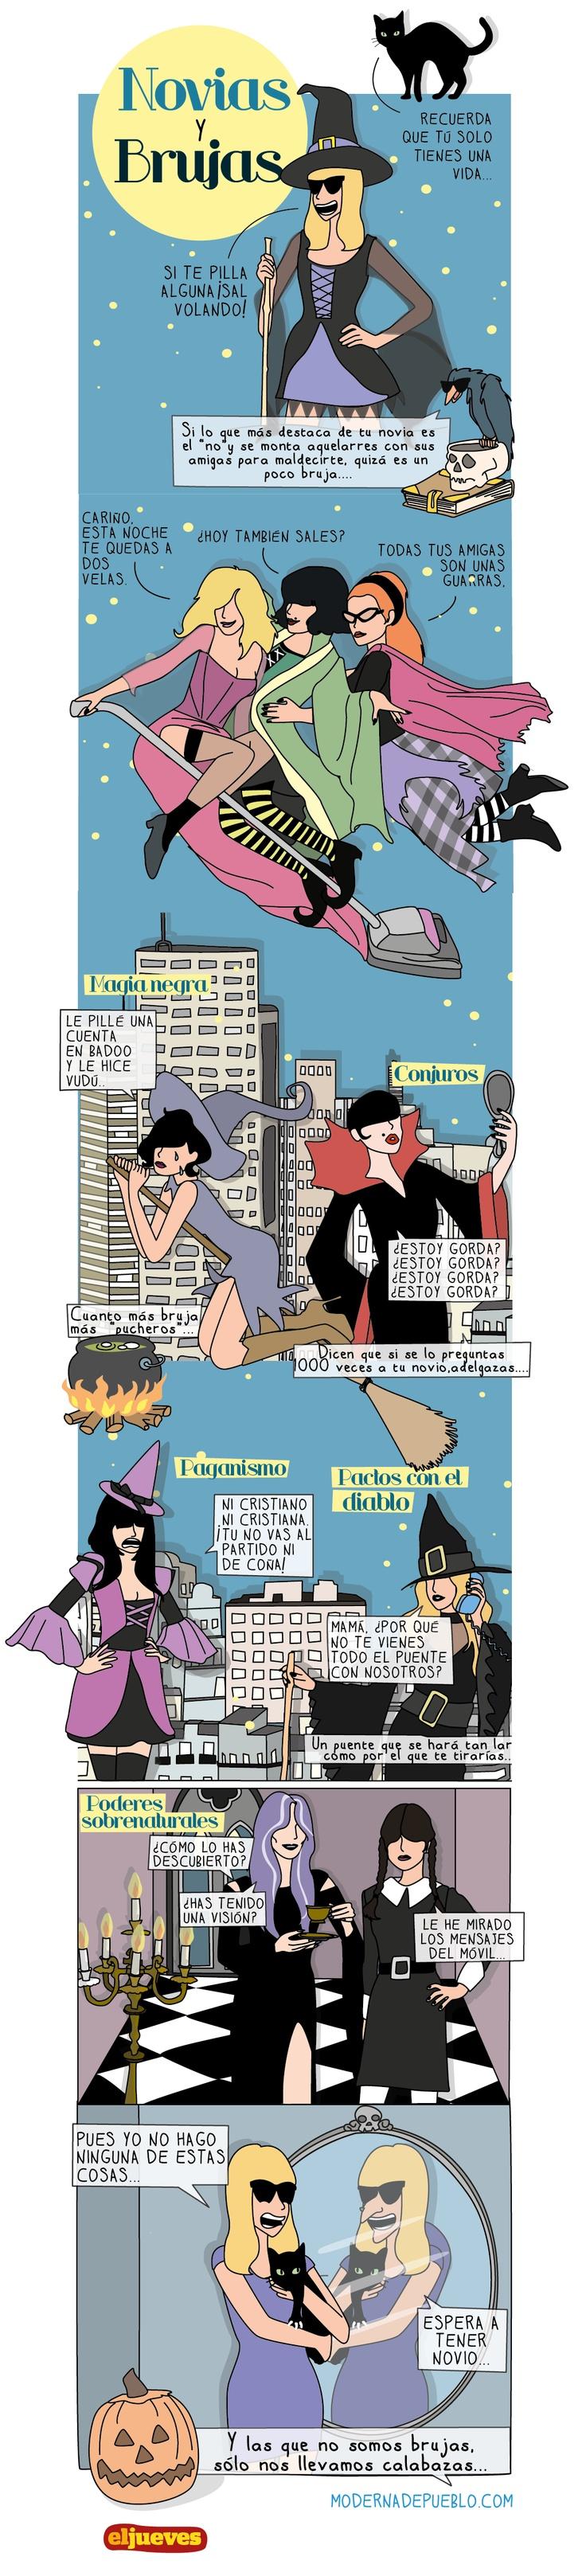 Mola ser una bruja :-)